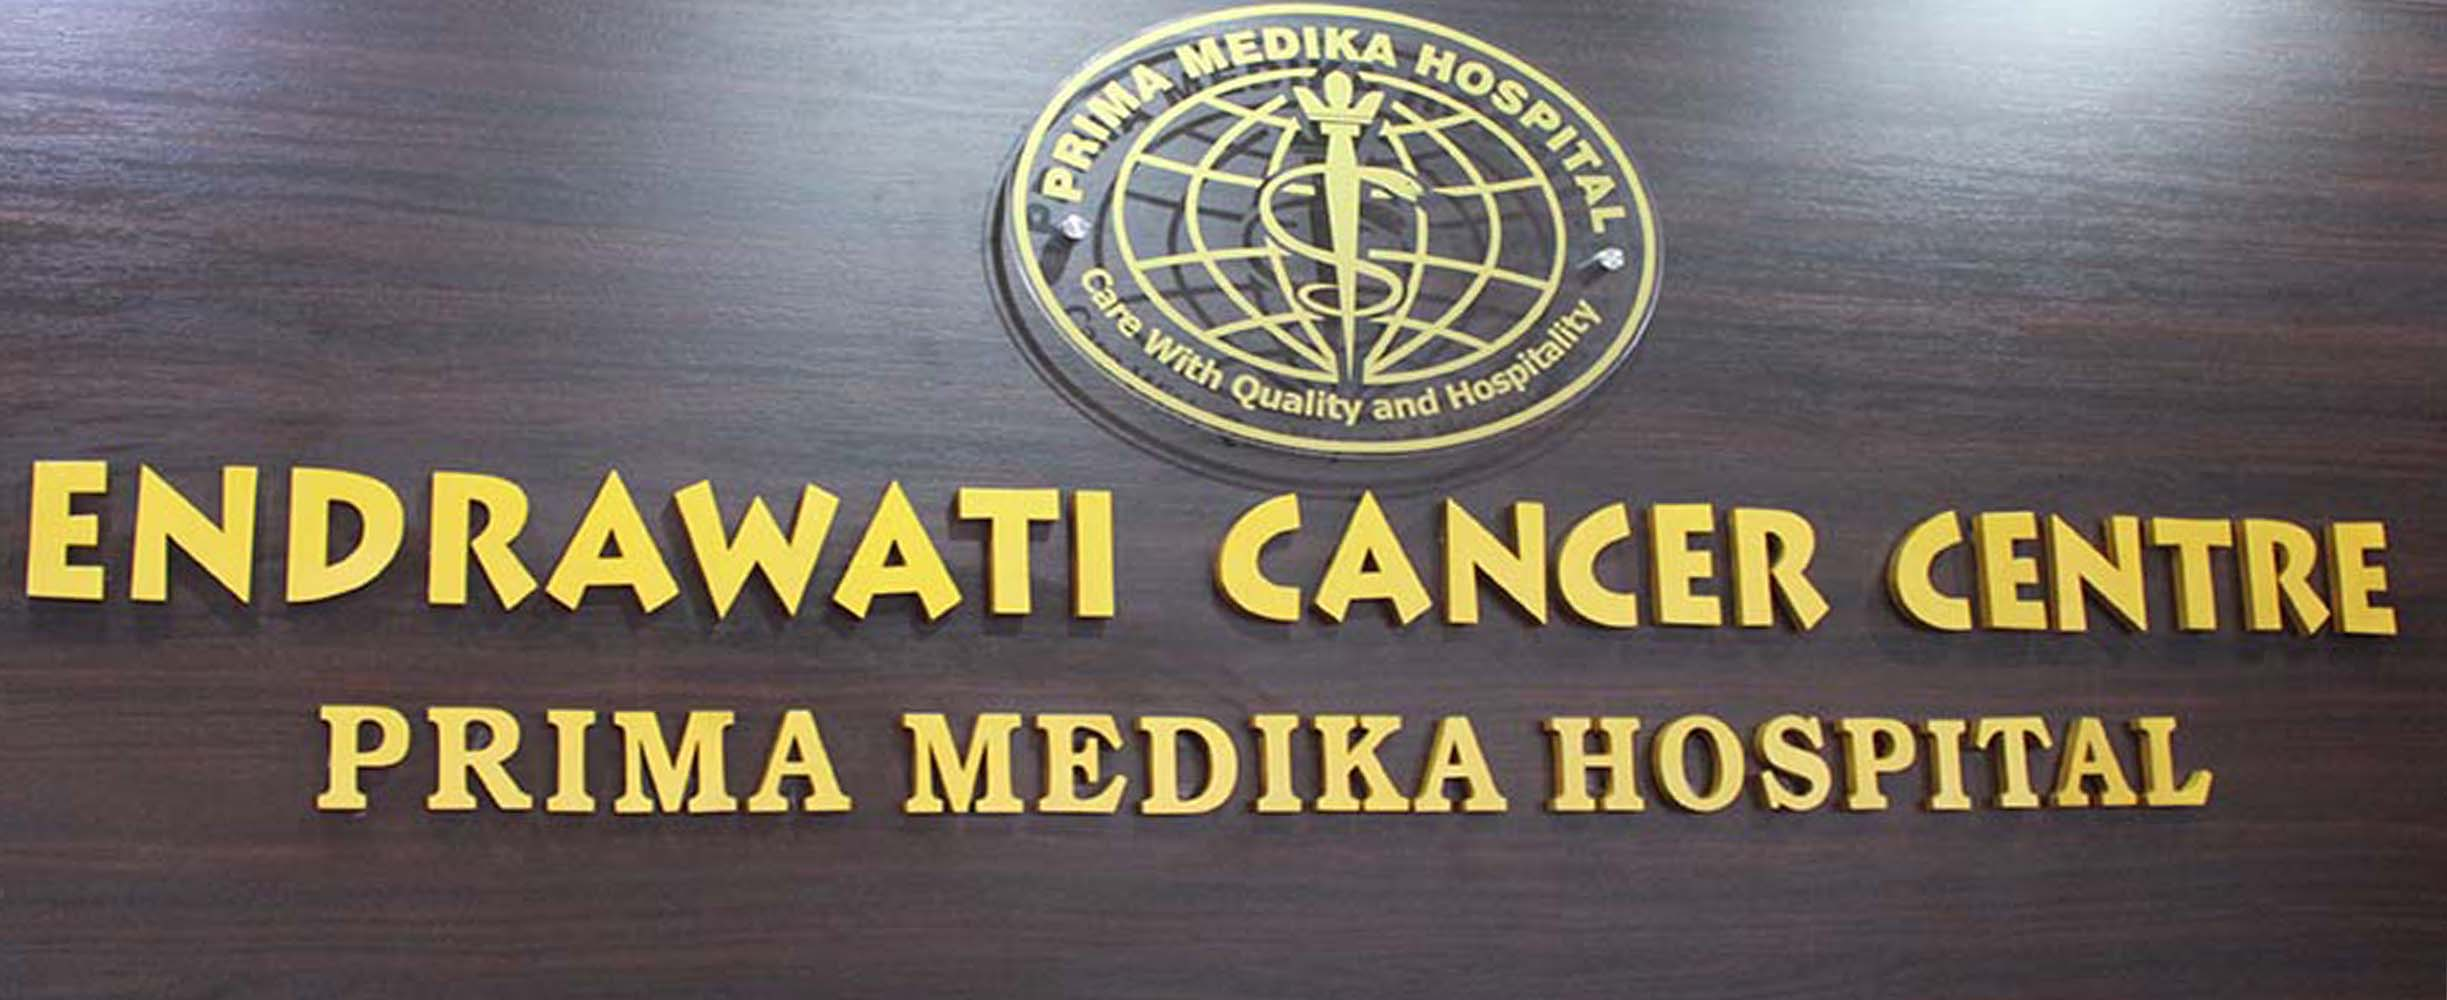 Endrawati Cancer Center